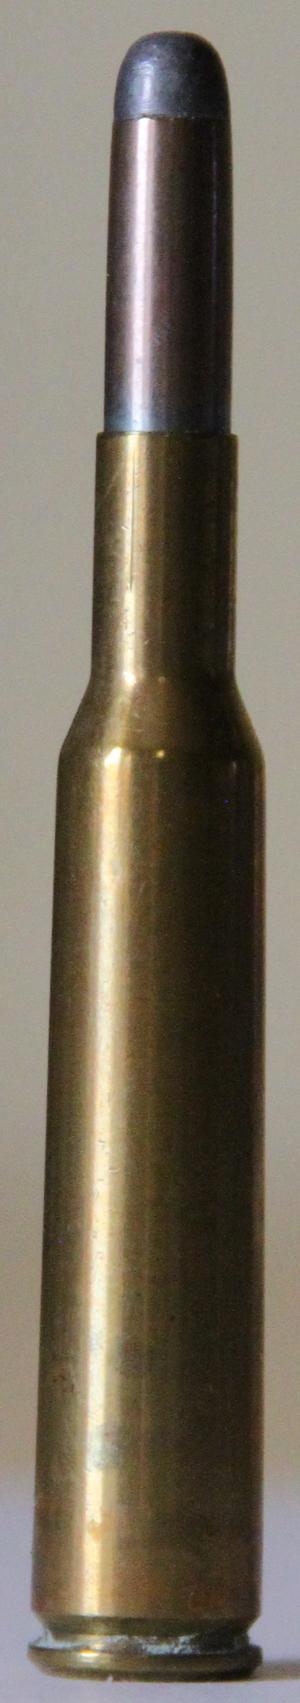 6mm Lee Navy - Image: 6mmleenavy